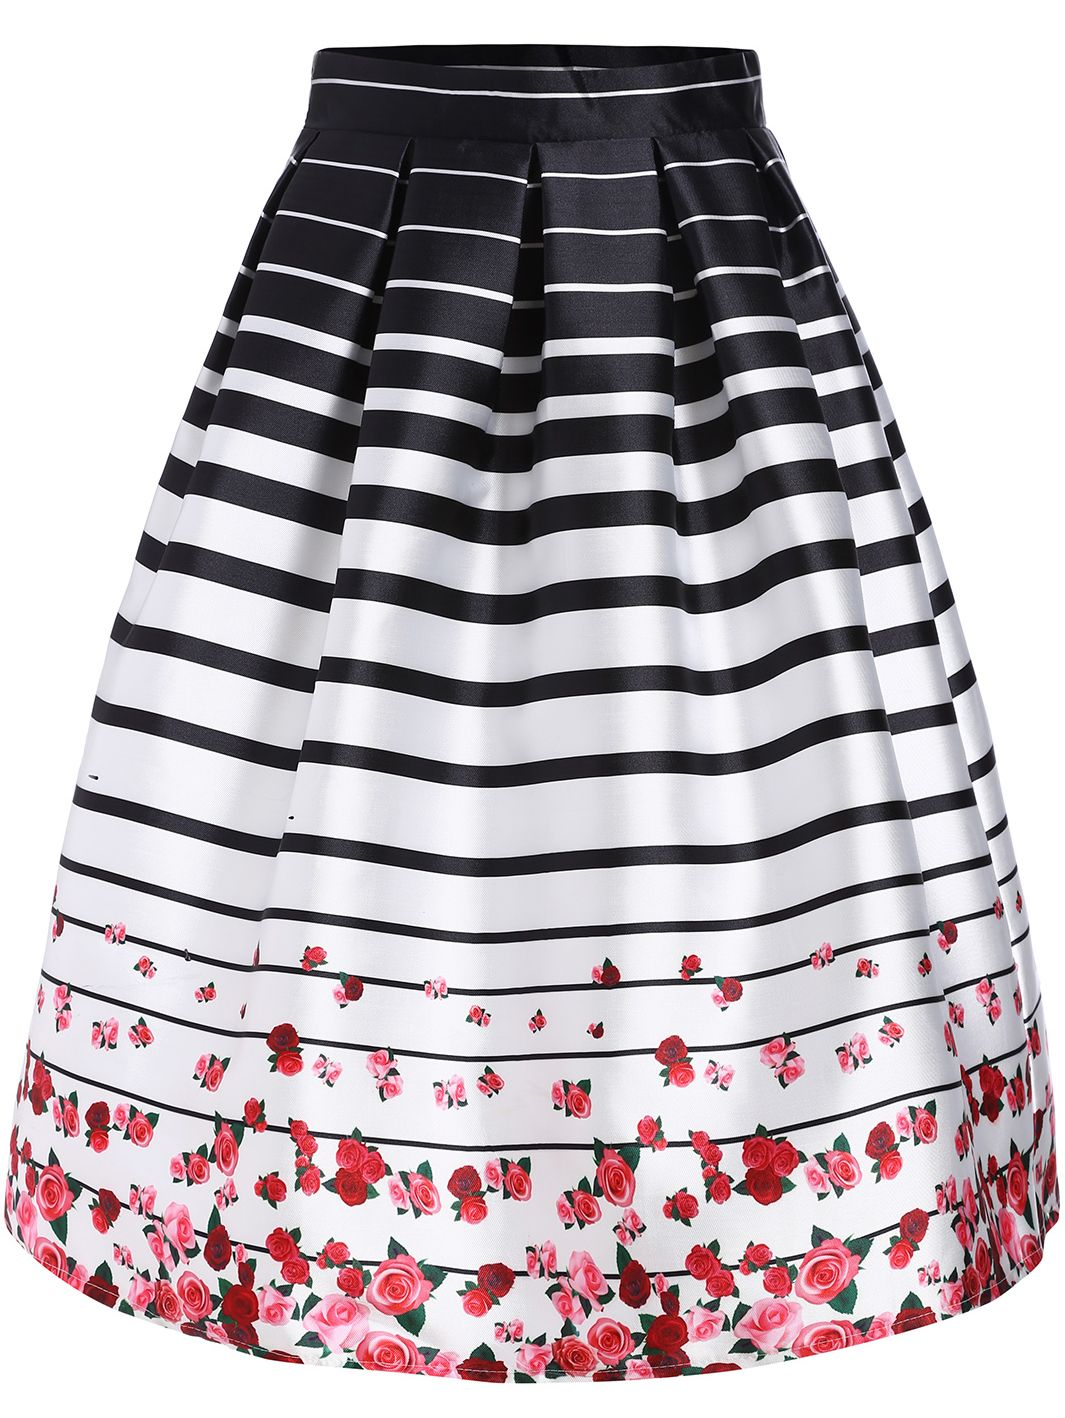 ce05cdb40 Black White Striped Rose Print Flare Skirt 23.67   Wardrobe ...